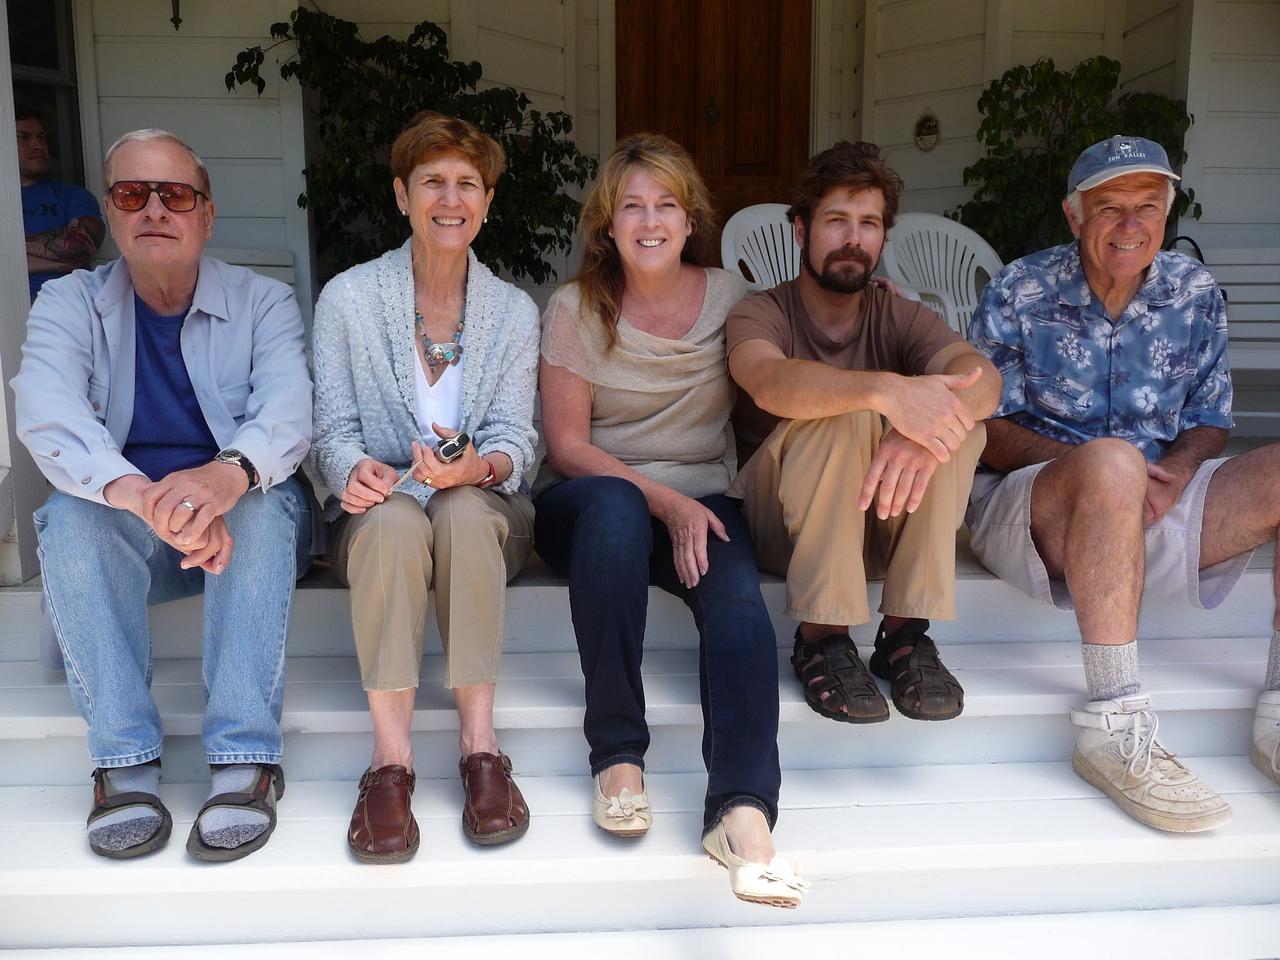 Dick & Patsy Kiechler, Mare & Chris Williams, Mike O'Gara